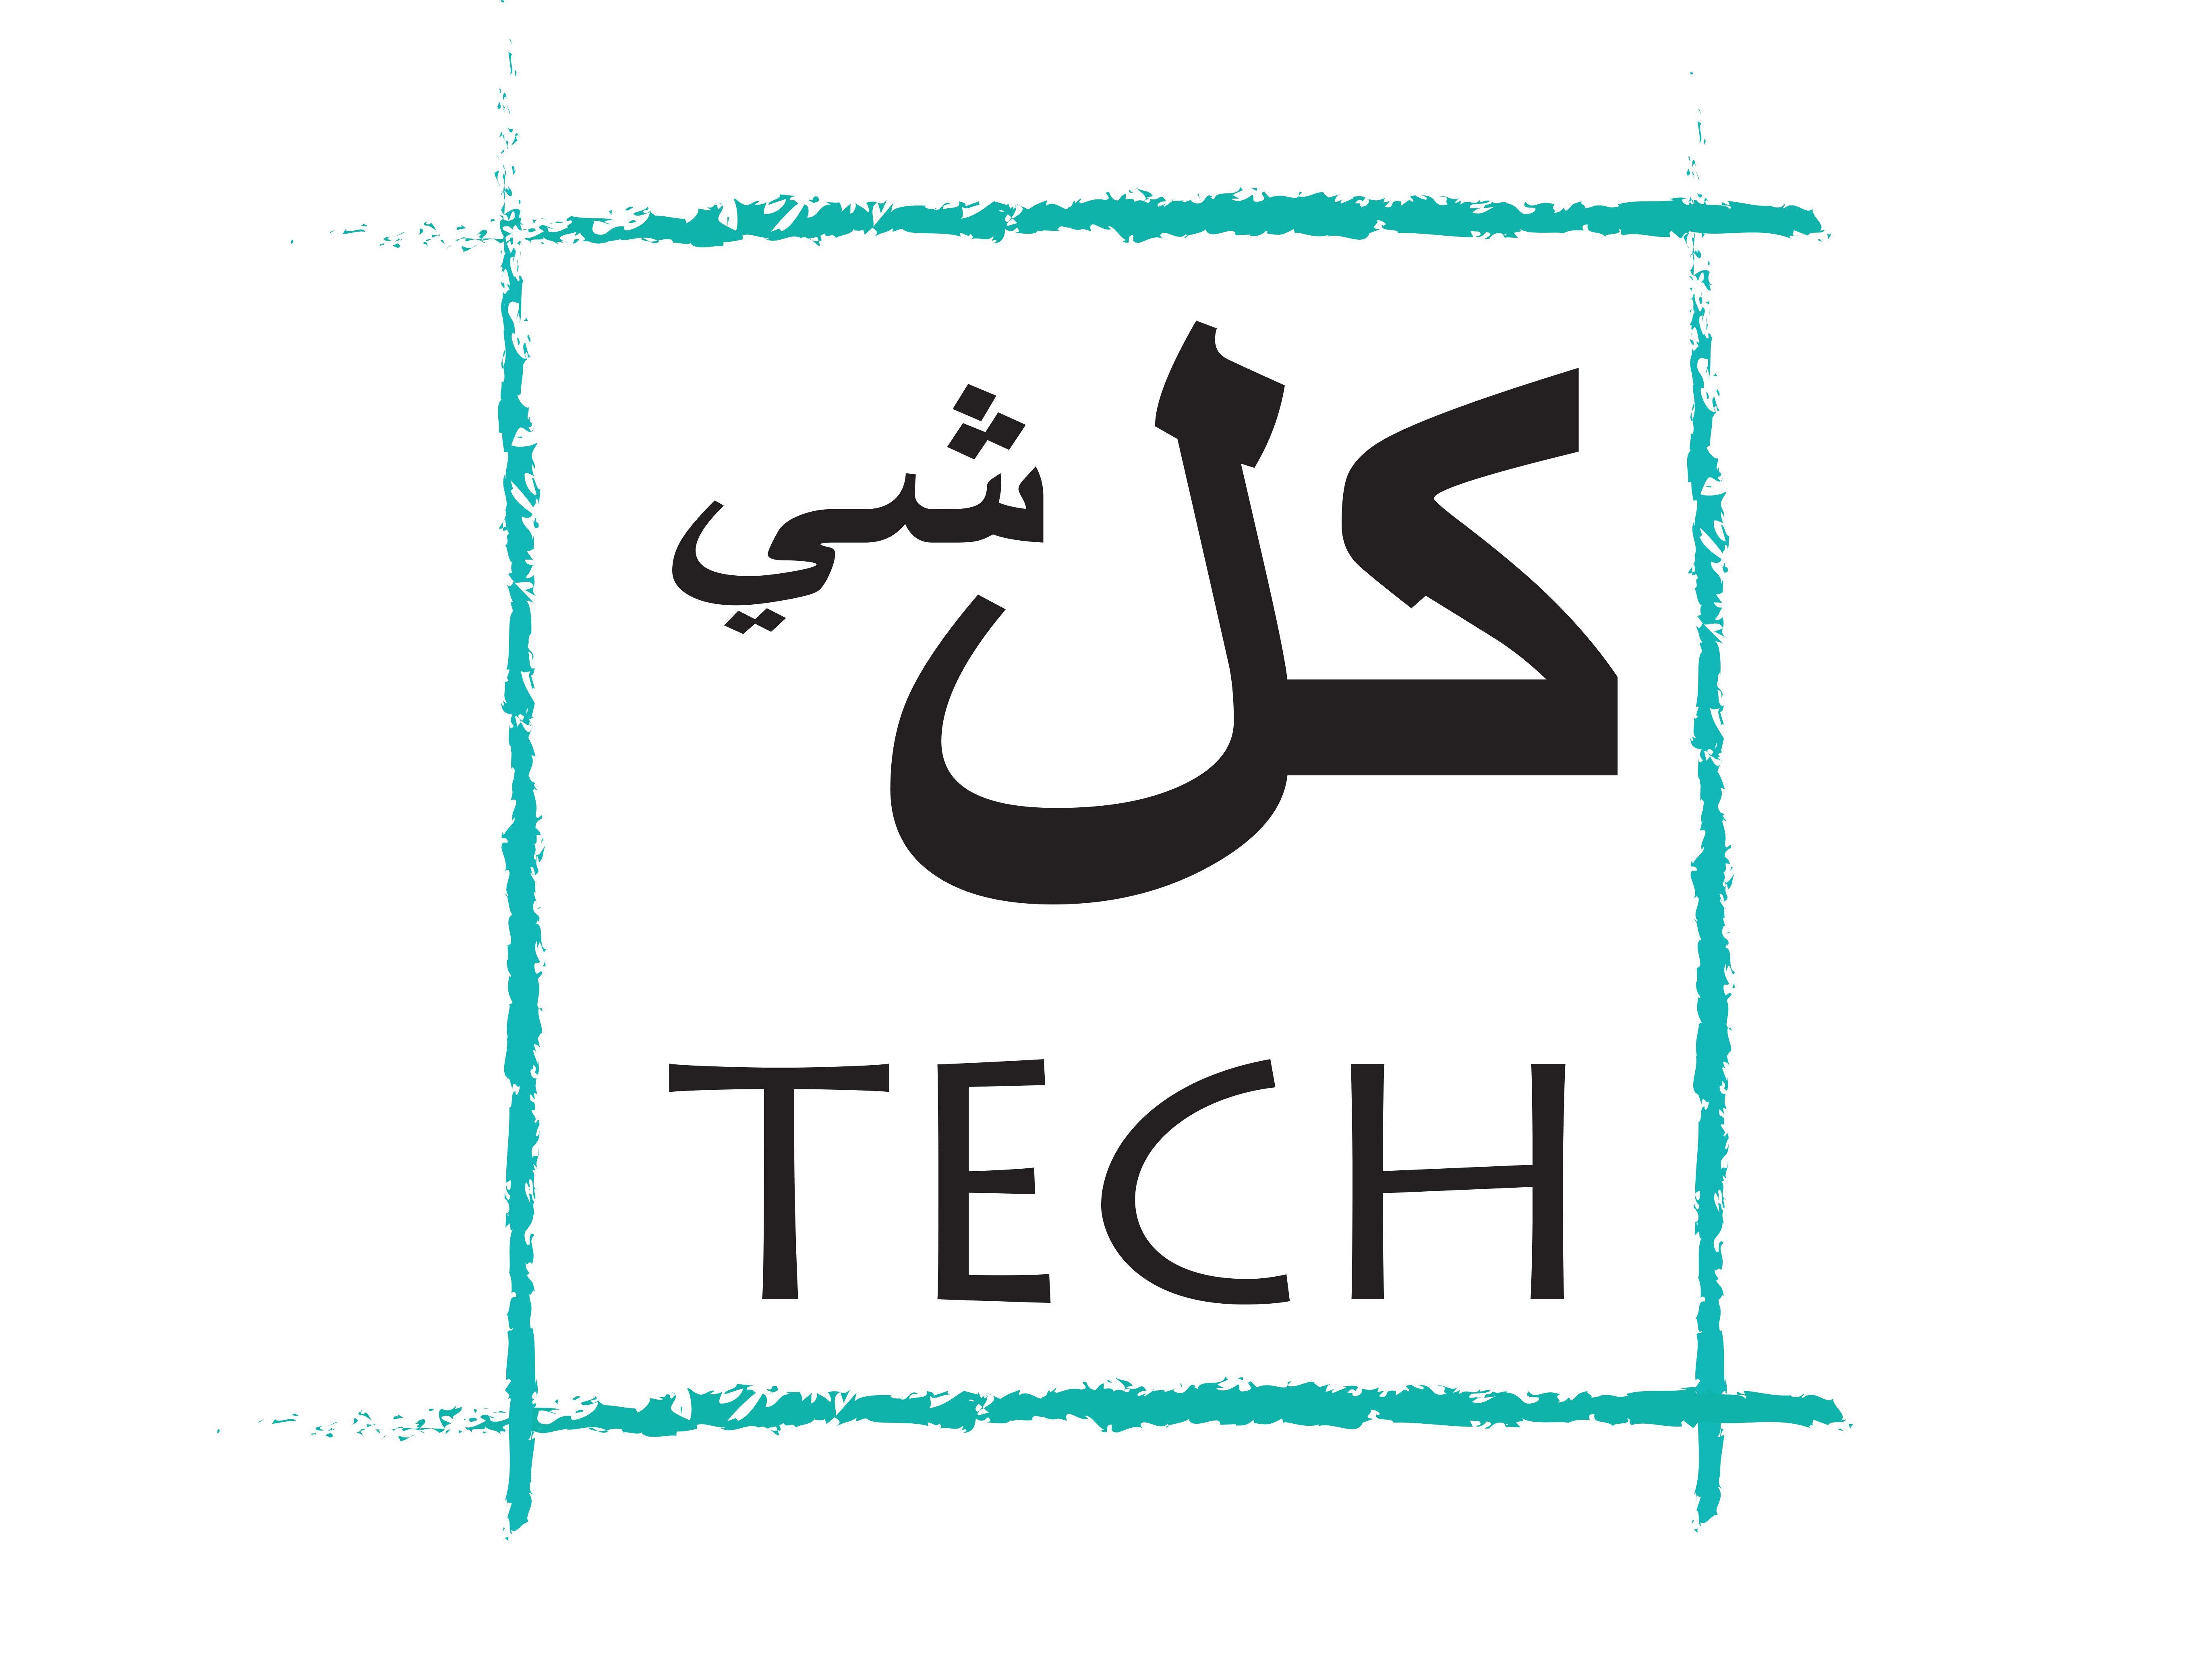 KelShiTech